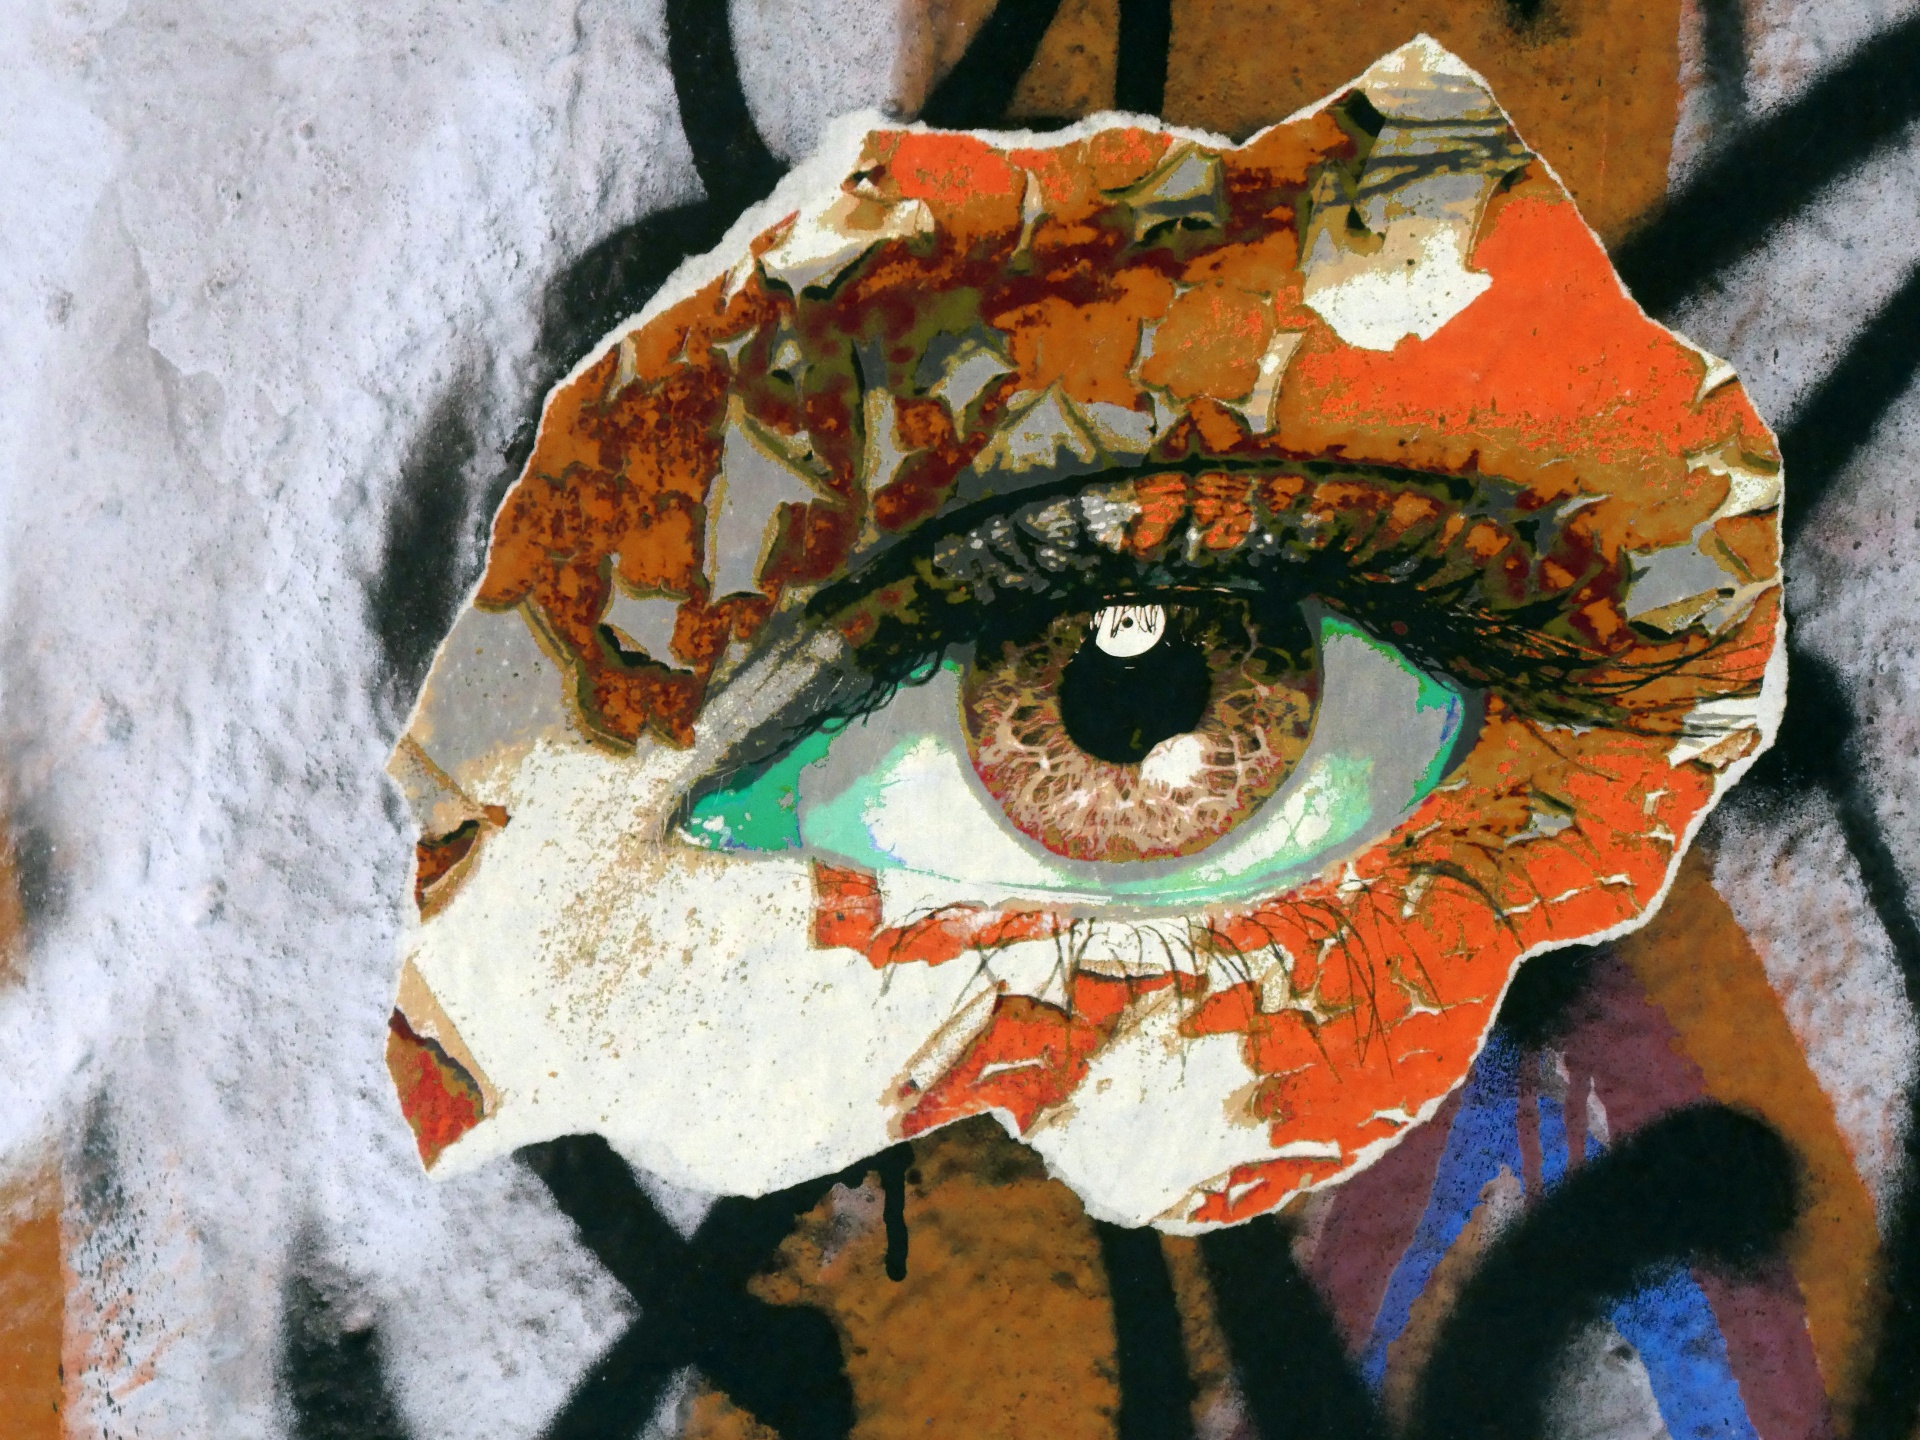 Grunge Girl Wallpaper Graffiti Eye Free Stock Photo Public Domain Pictures